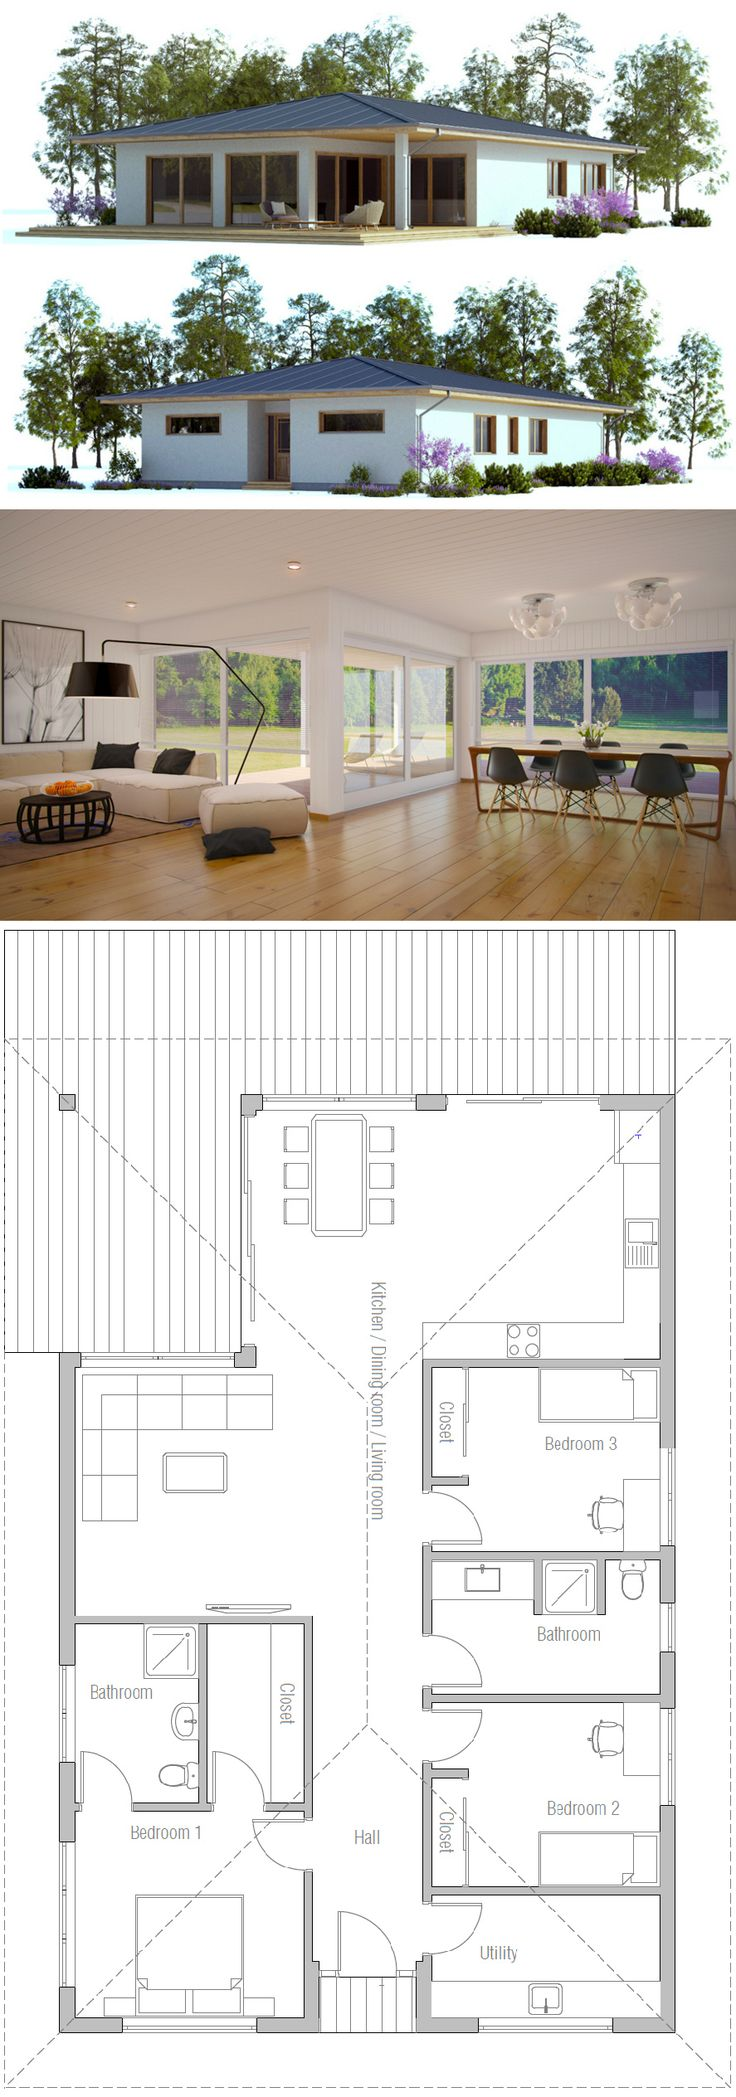 Fine 1000 Images About Building Plans On Pinterest Small House Plans Largest Home Design Picture Inspirations Pitcheantrous